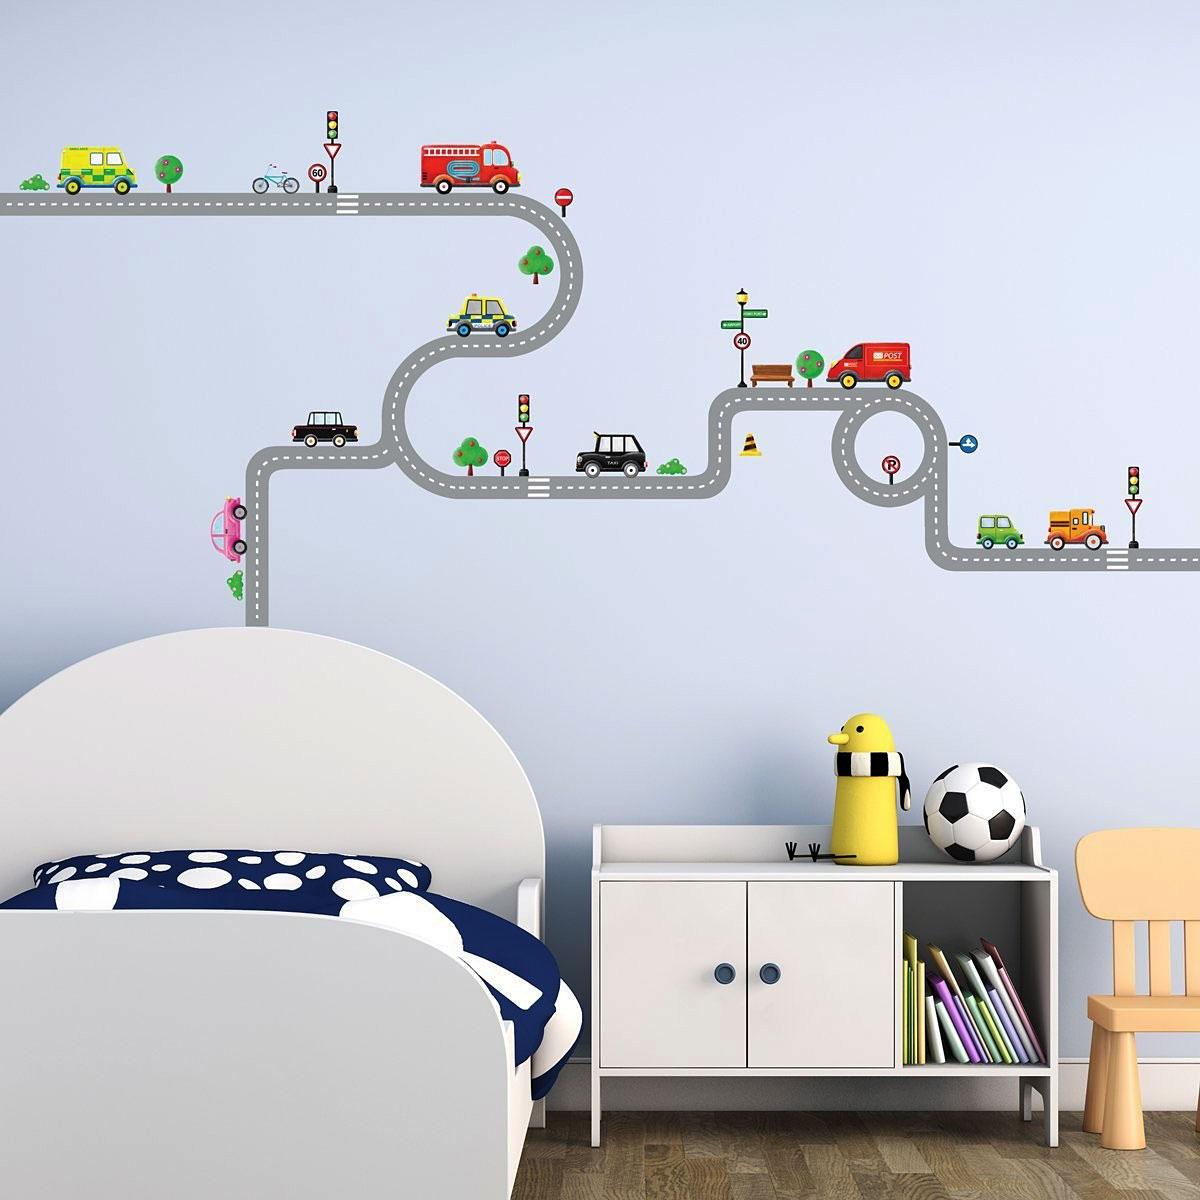 Home Decor Wandsticker Wandpuzzle Wandtattoo Autobahn Strassen Autos Kinderzimmer Jungen Home Furniture Diy Tohoku Morinagamilk Co Jp